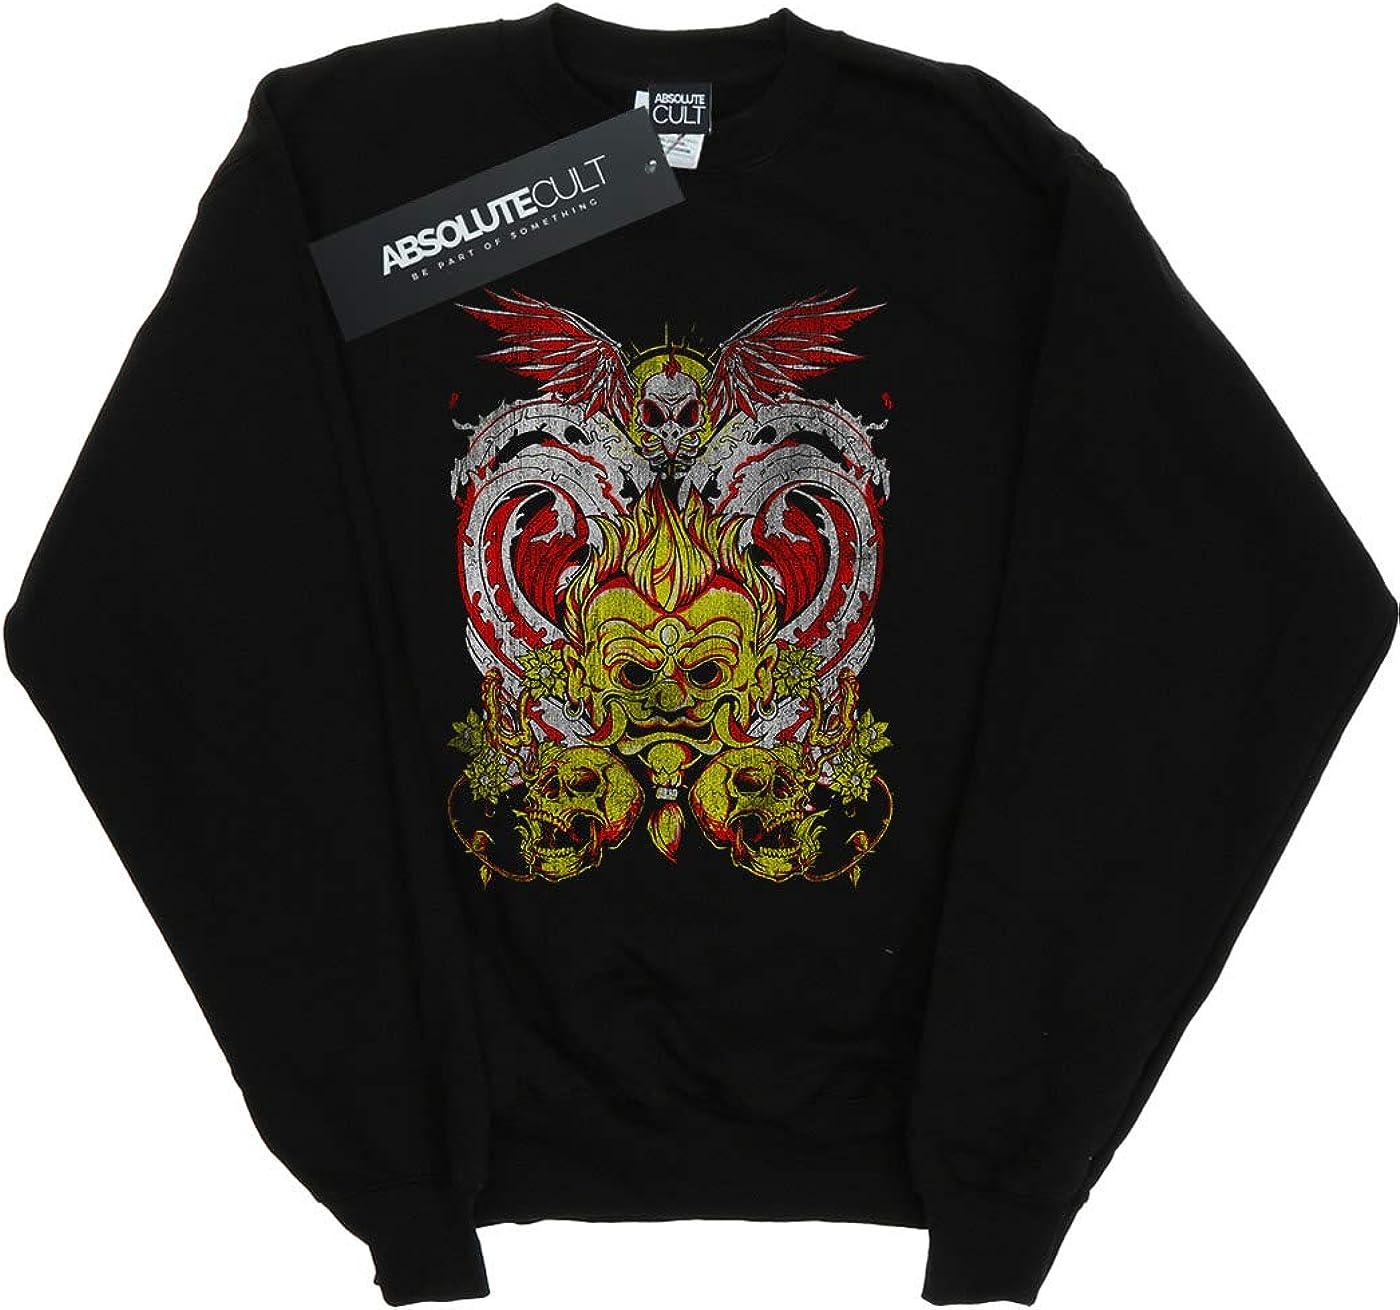 Absolute Cult Drewbacca Girls Dark Fire Sweatshirt